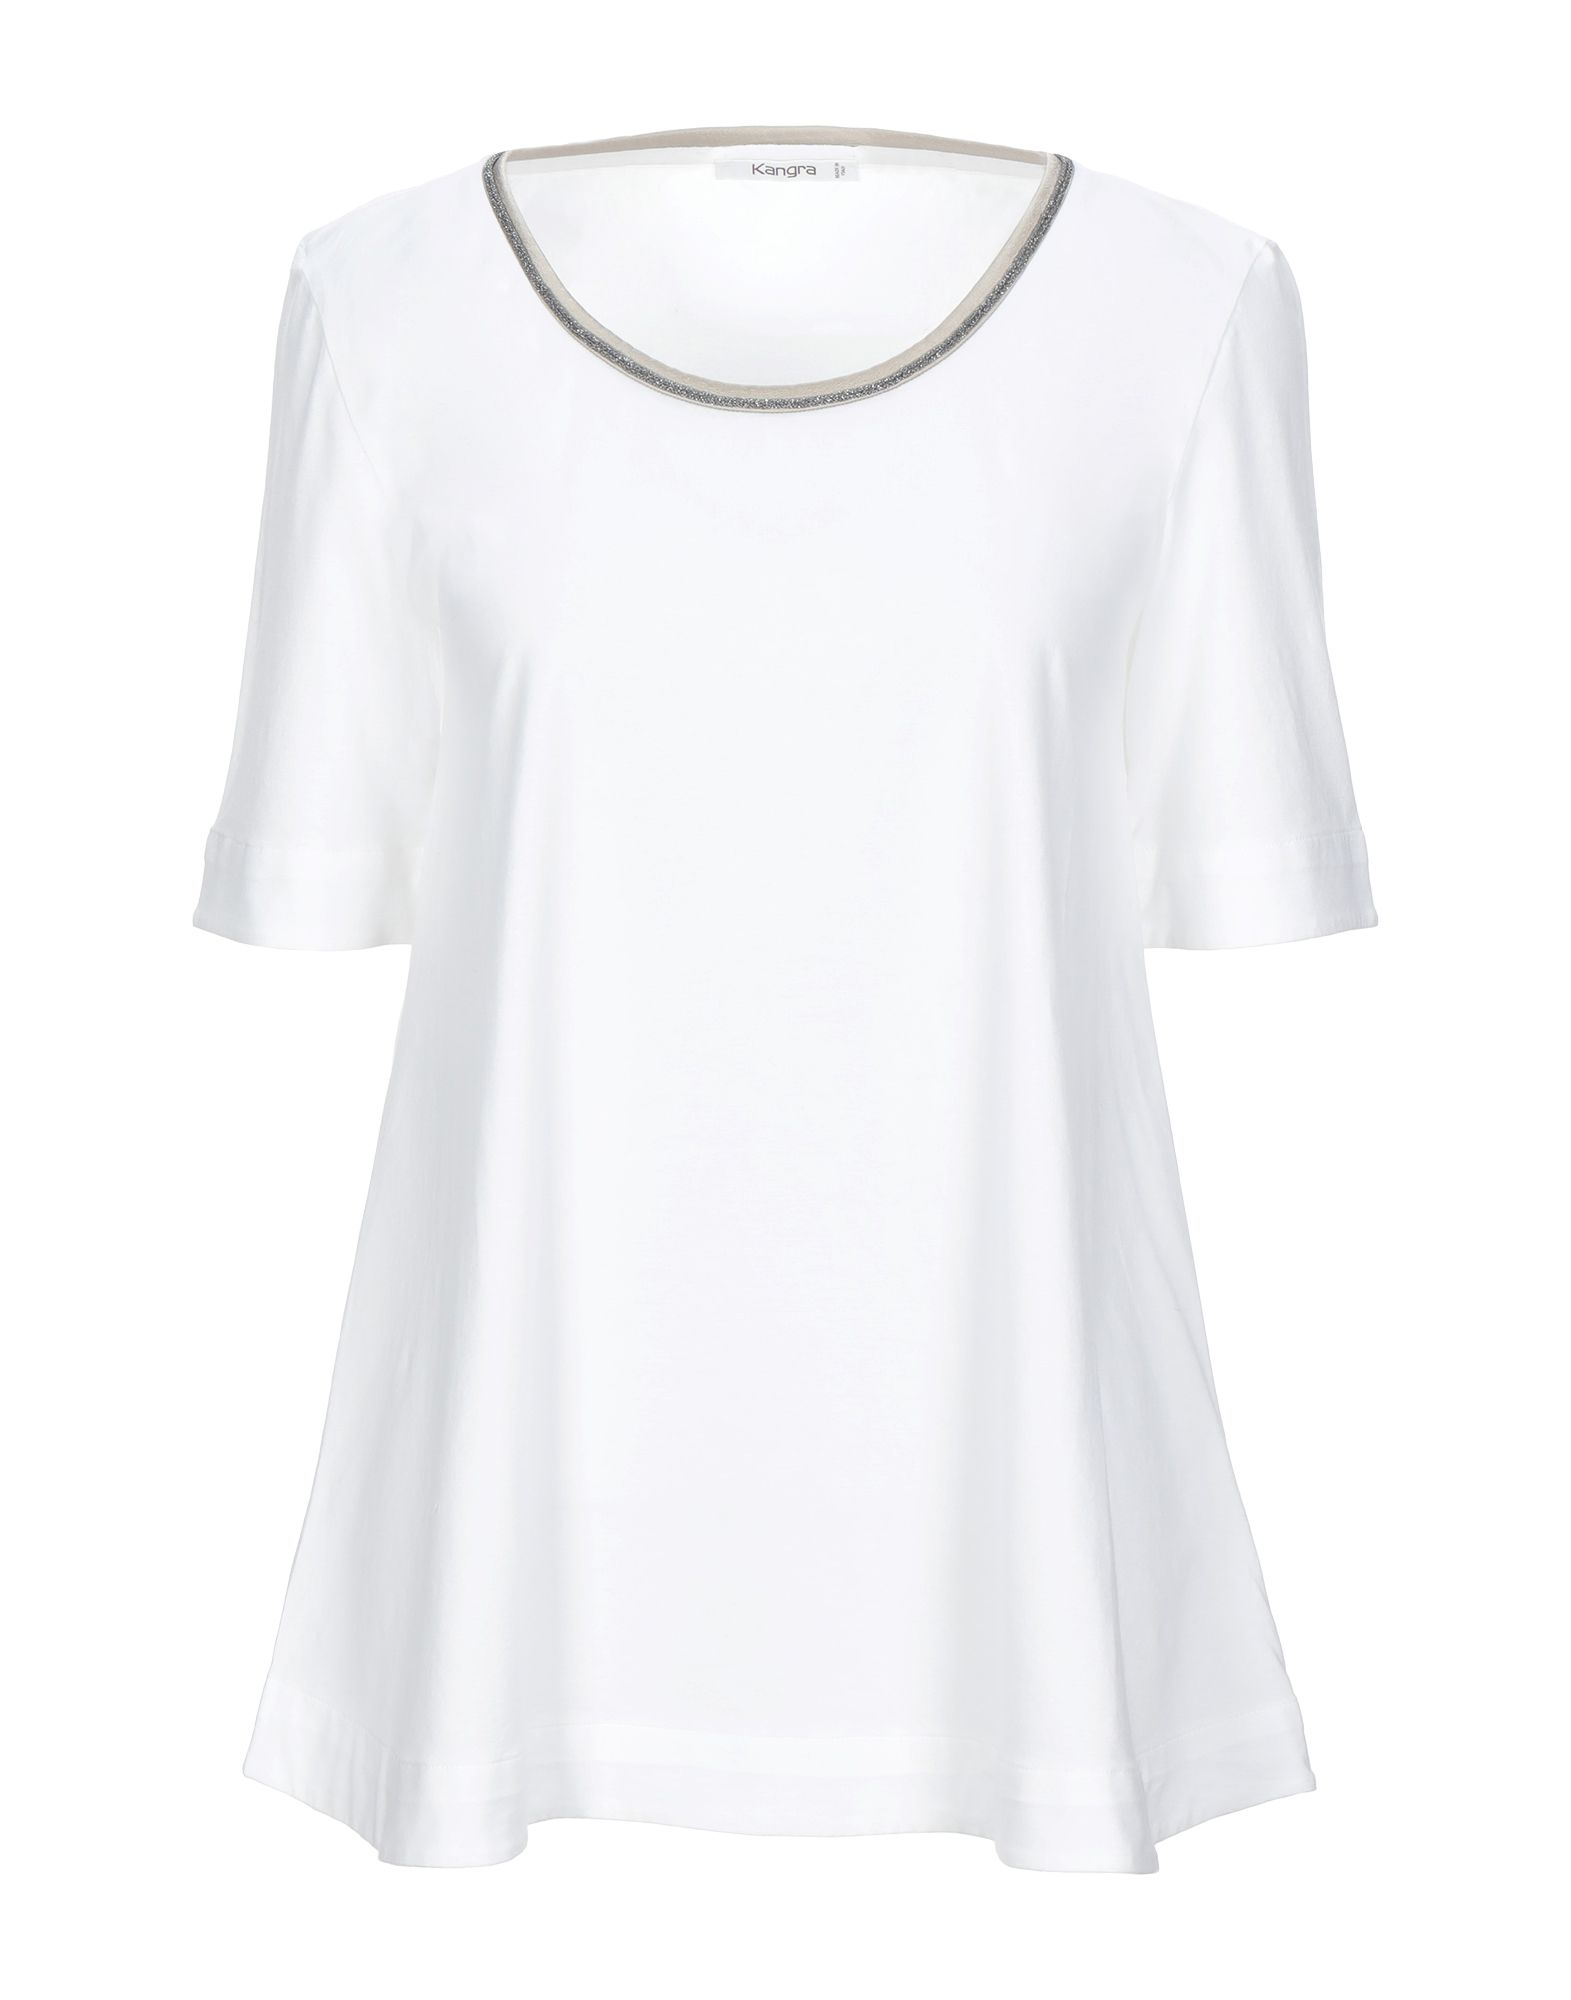 kangra cashmere футболка KANGRA CASHMERE Футболка